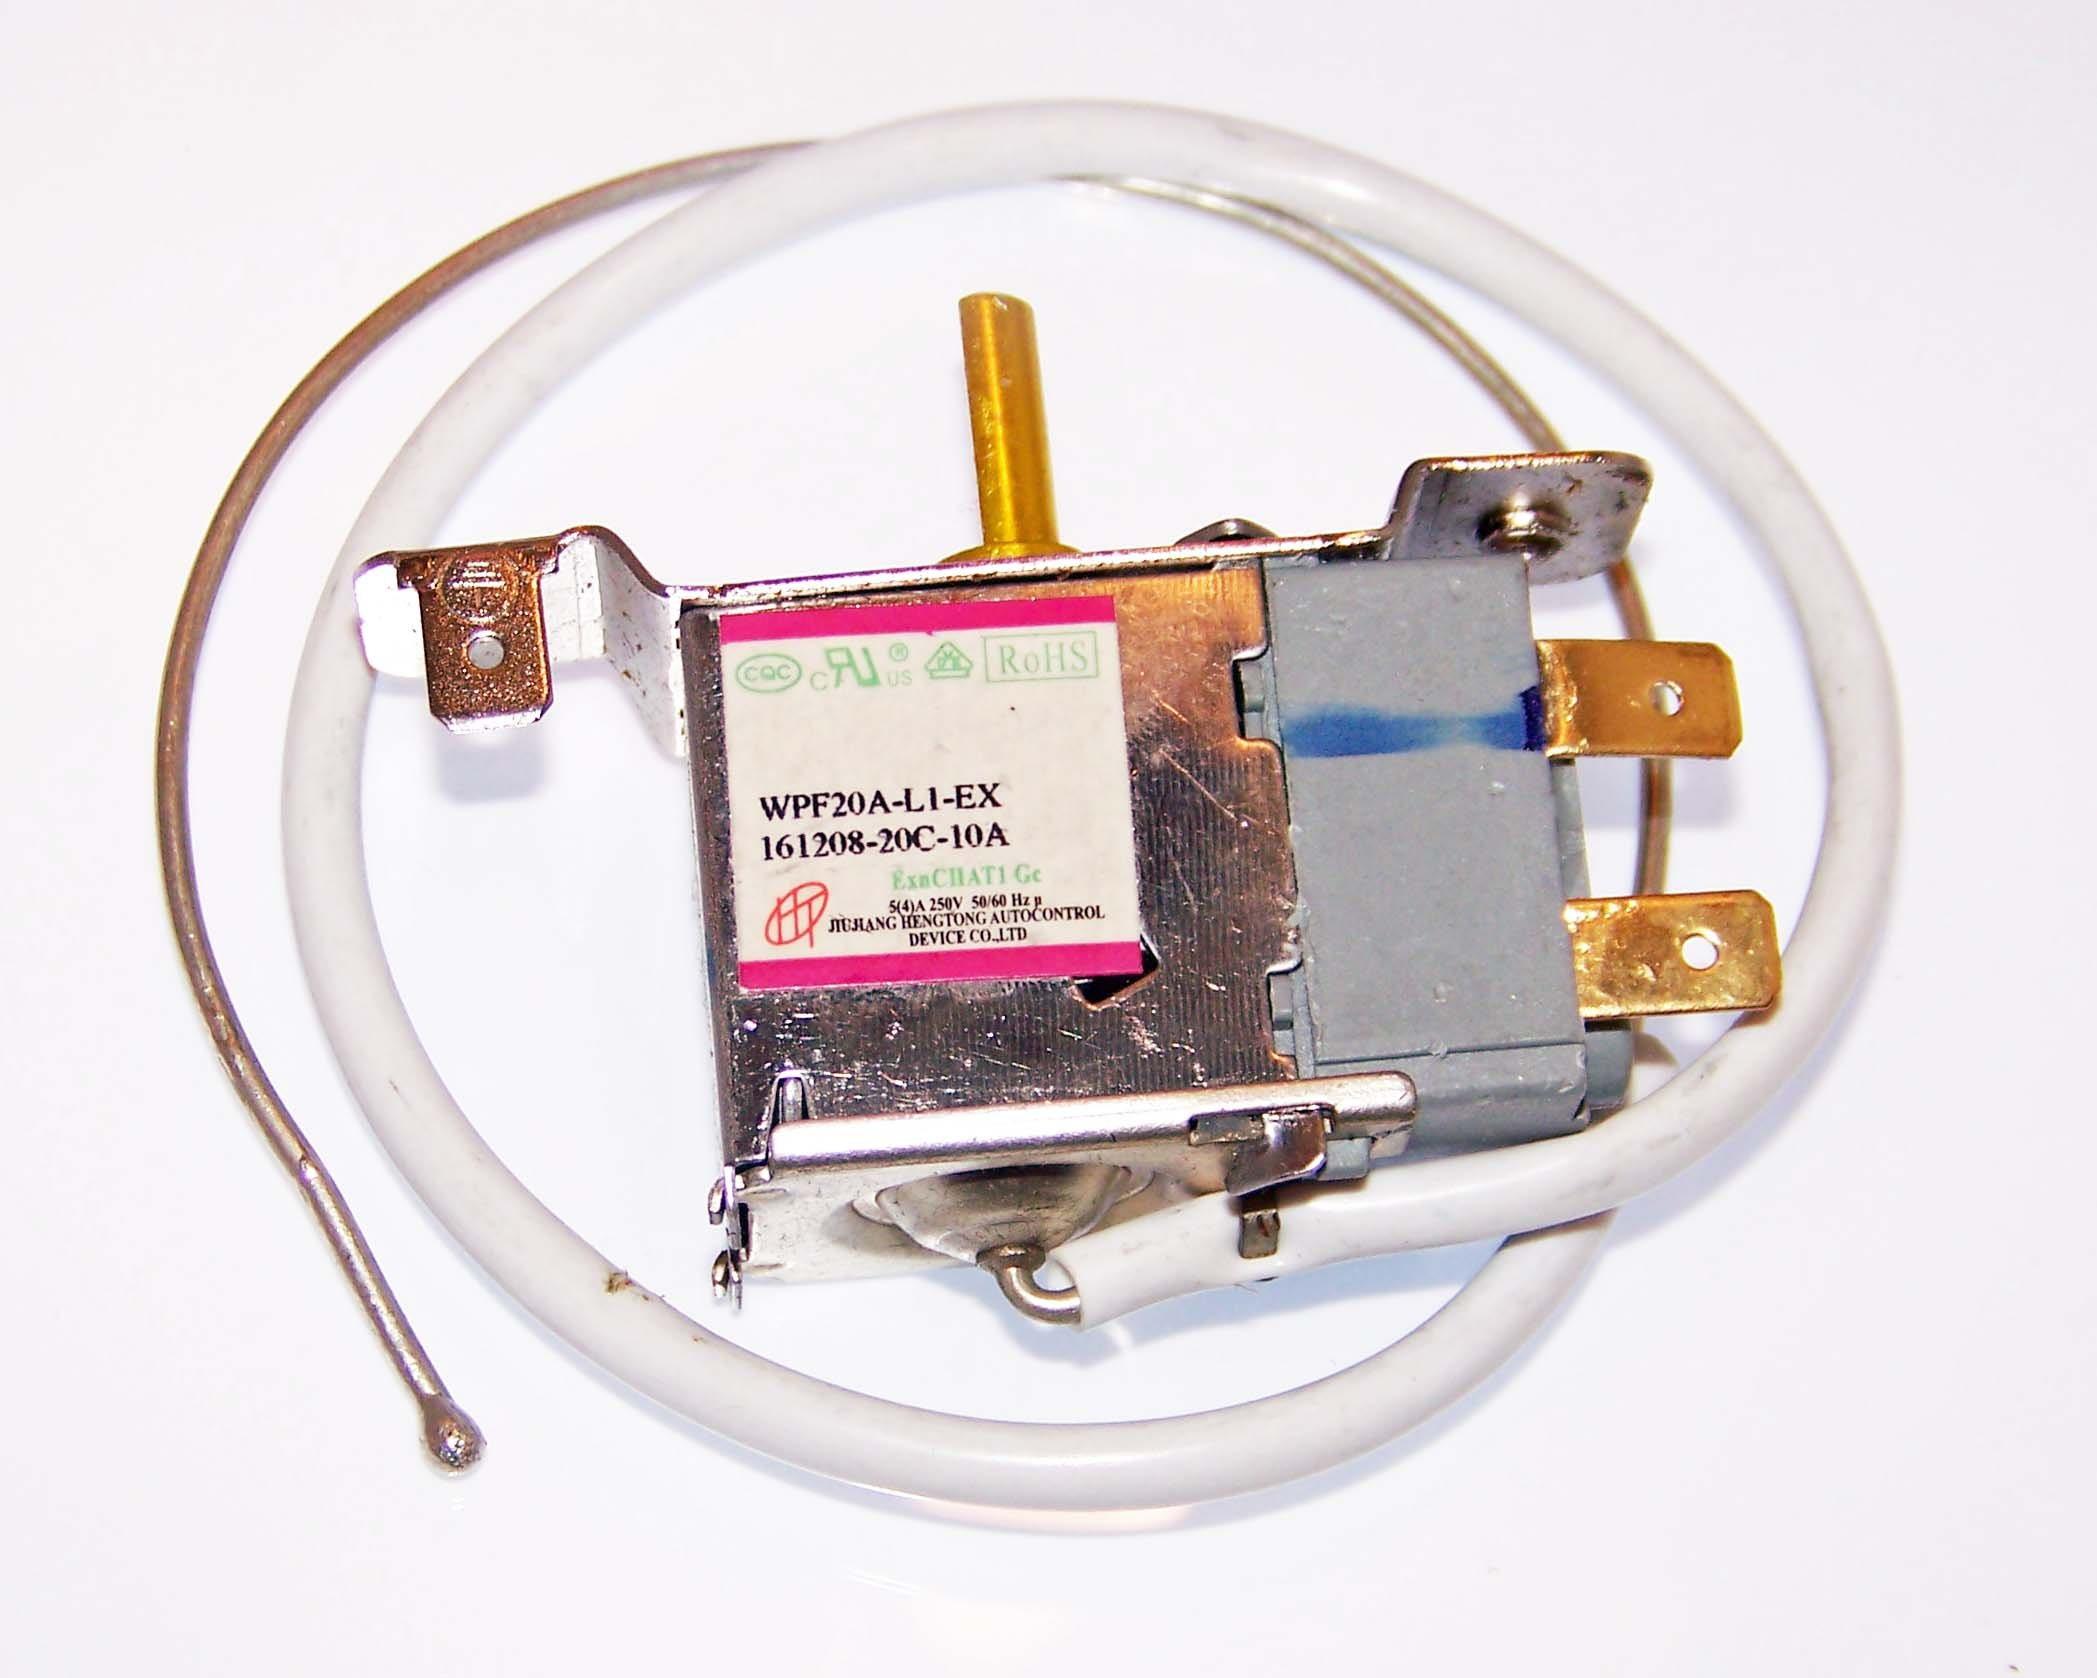 OEM Haier Refrigerator Thermostat For Haier BCE46B, HNSE045, HNSE045BB, HNSE045VS, HNSE04BB